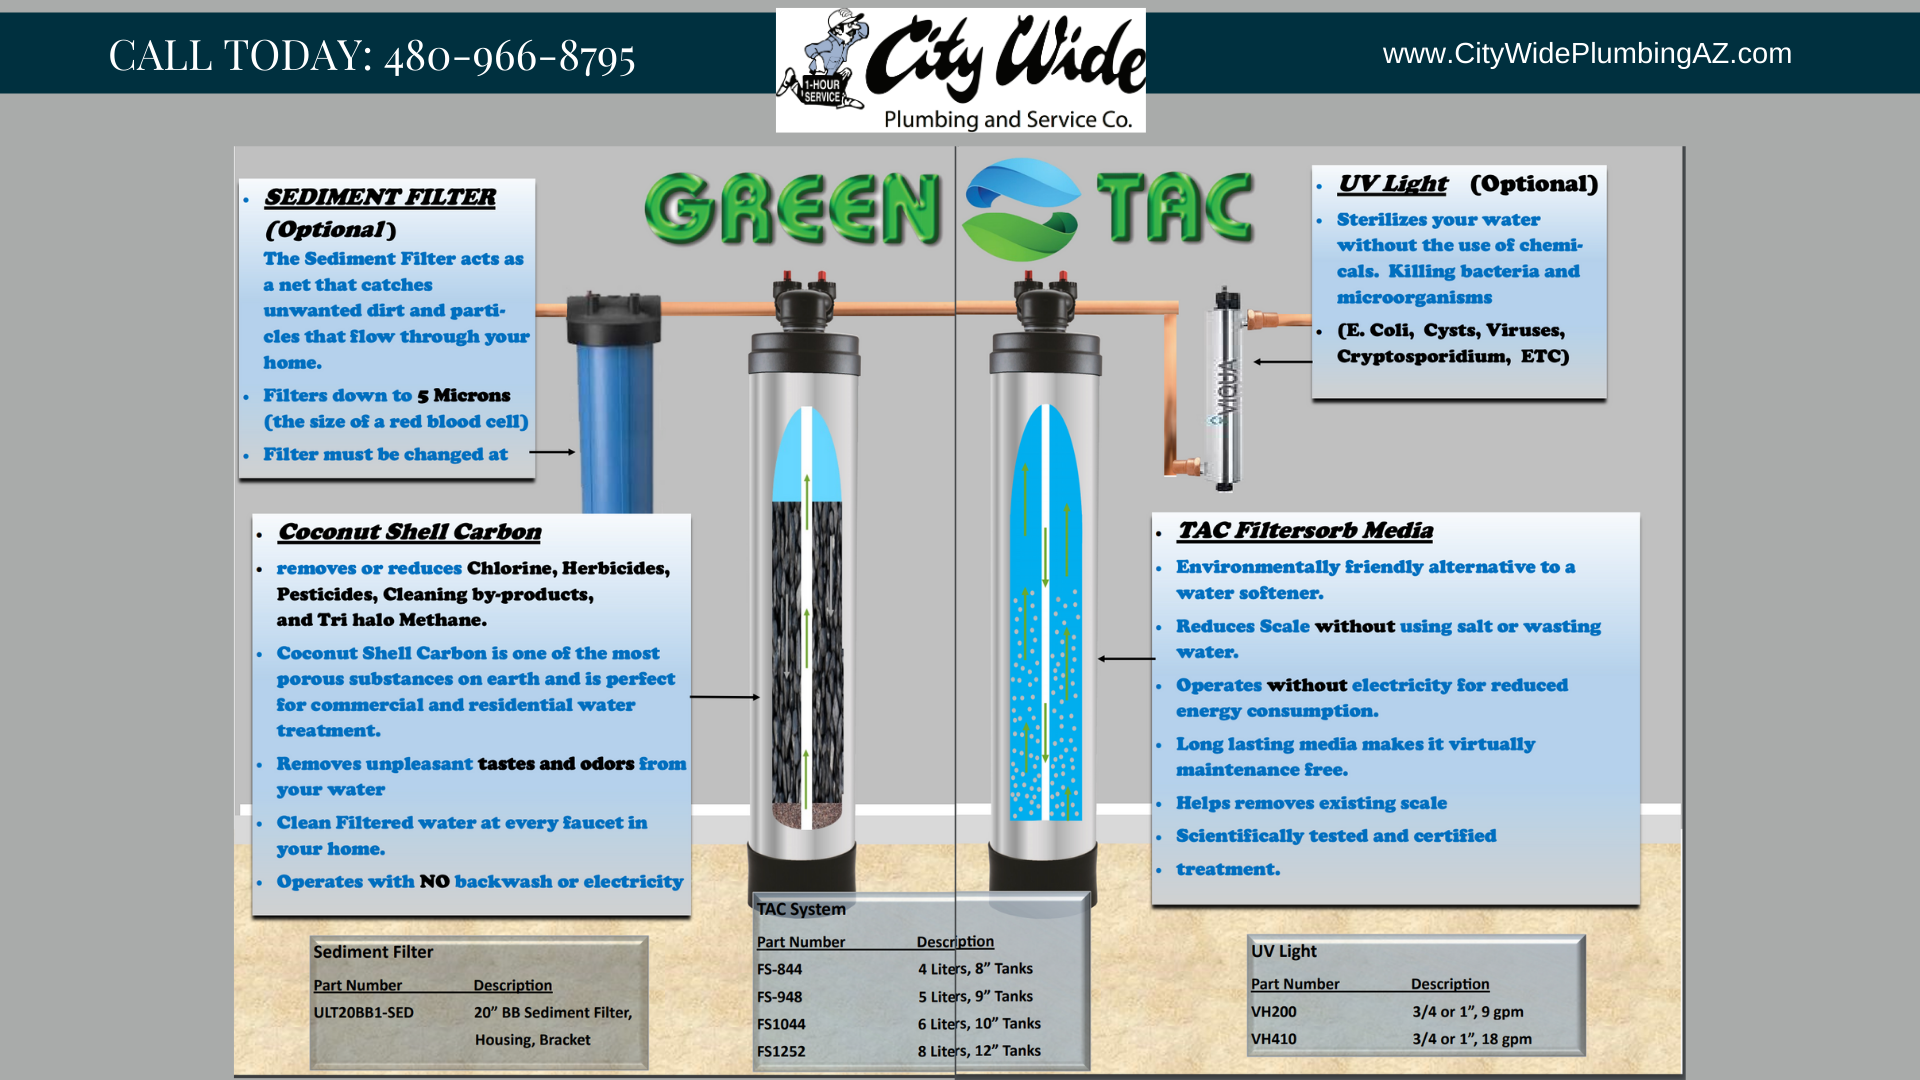 GREEN TAC